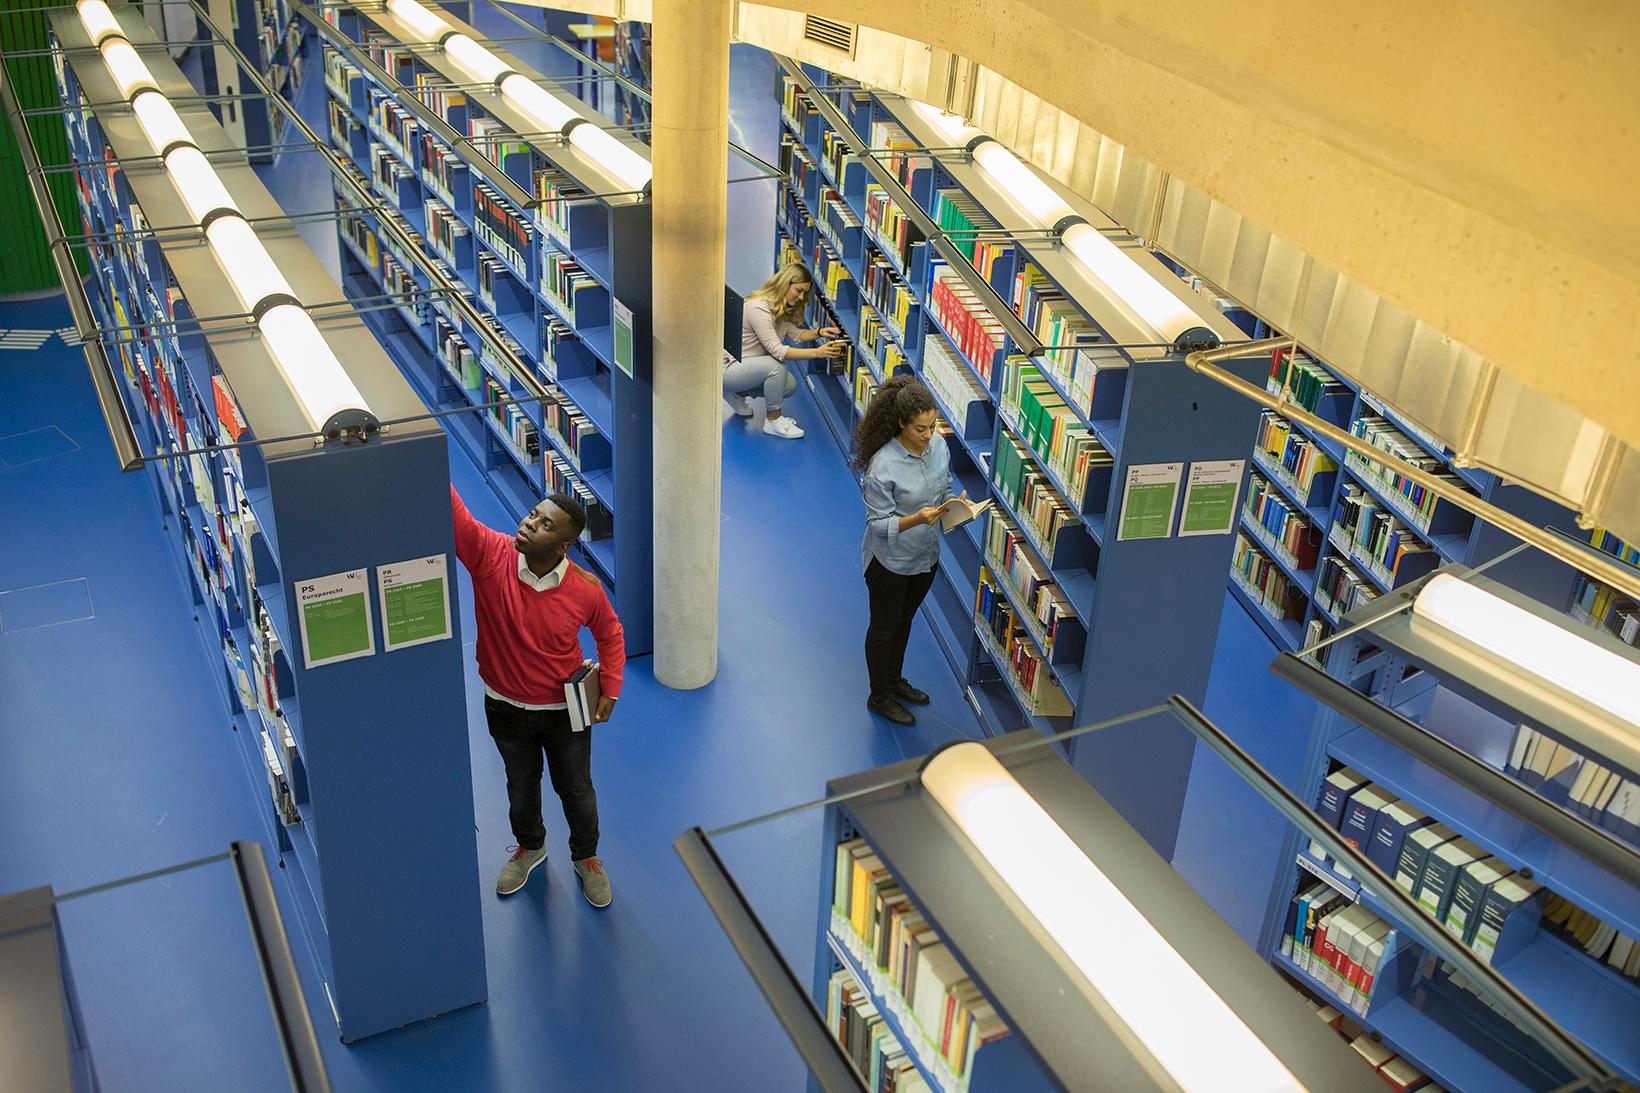 Studierende in der Bibliothek (c) Raimo Rudi Rumpler